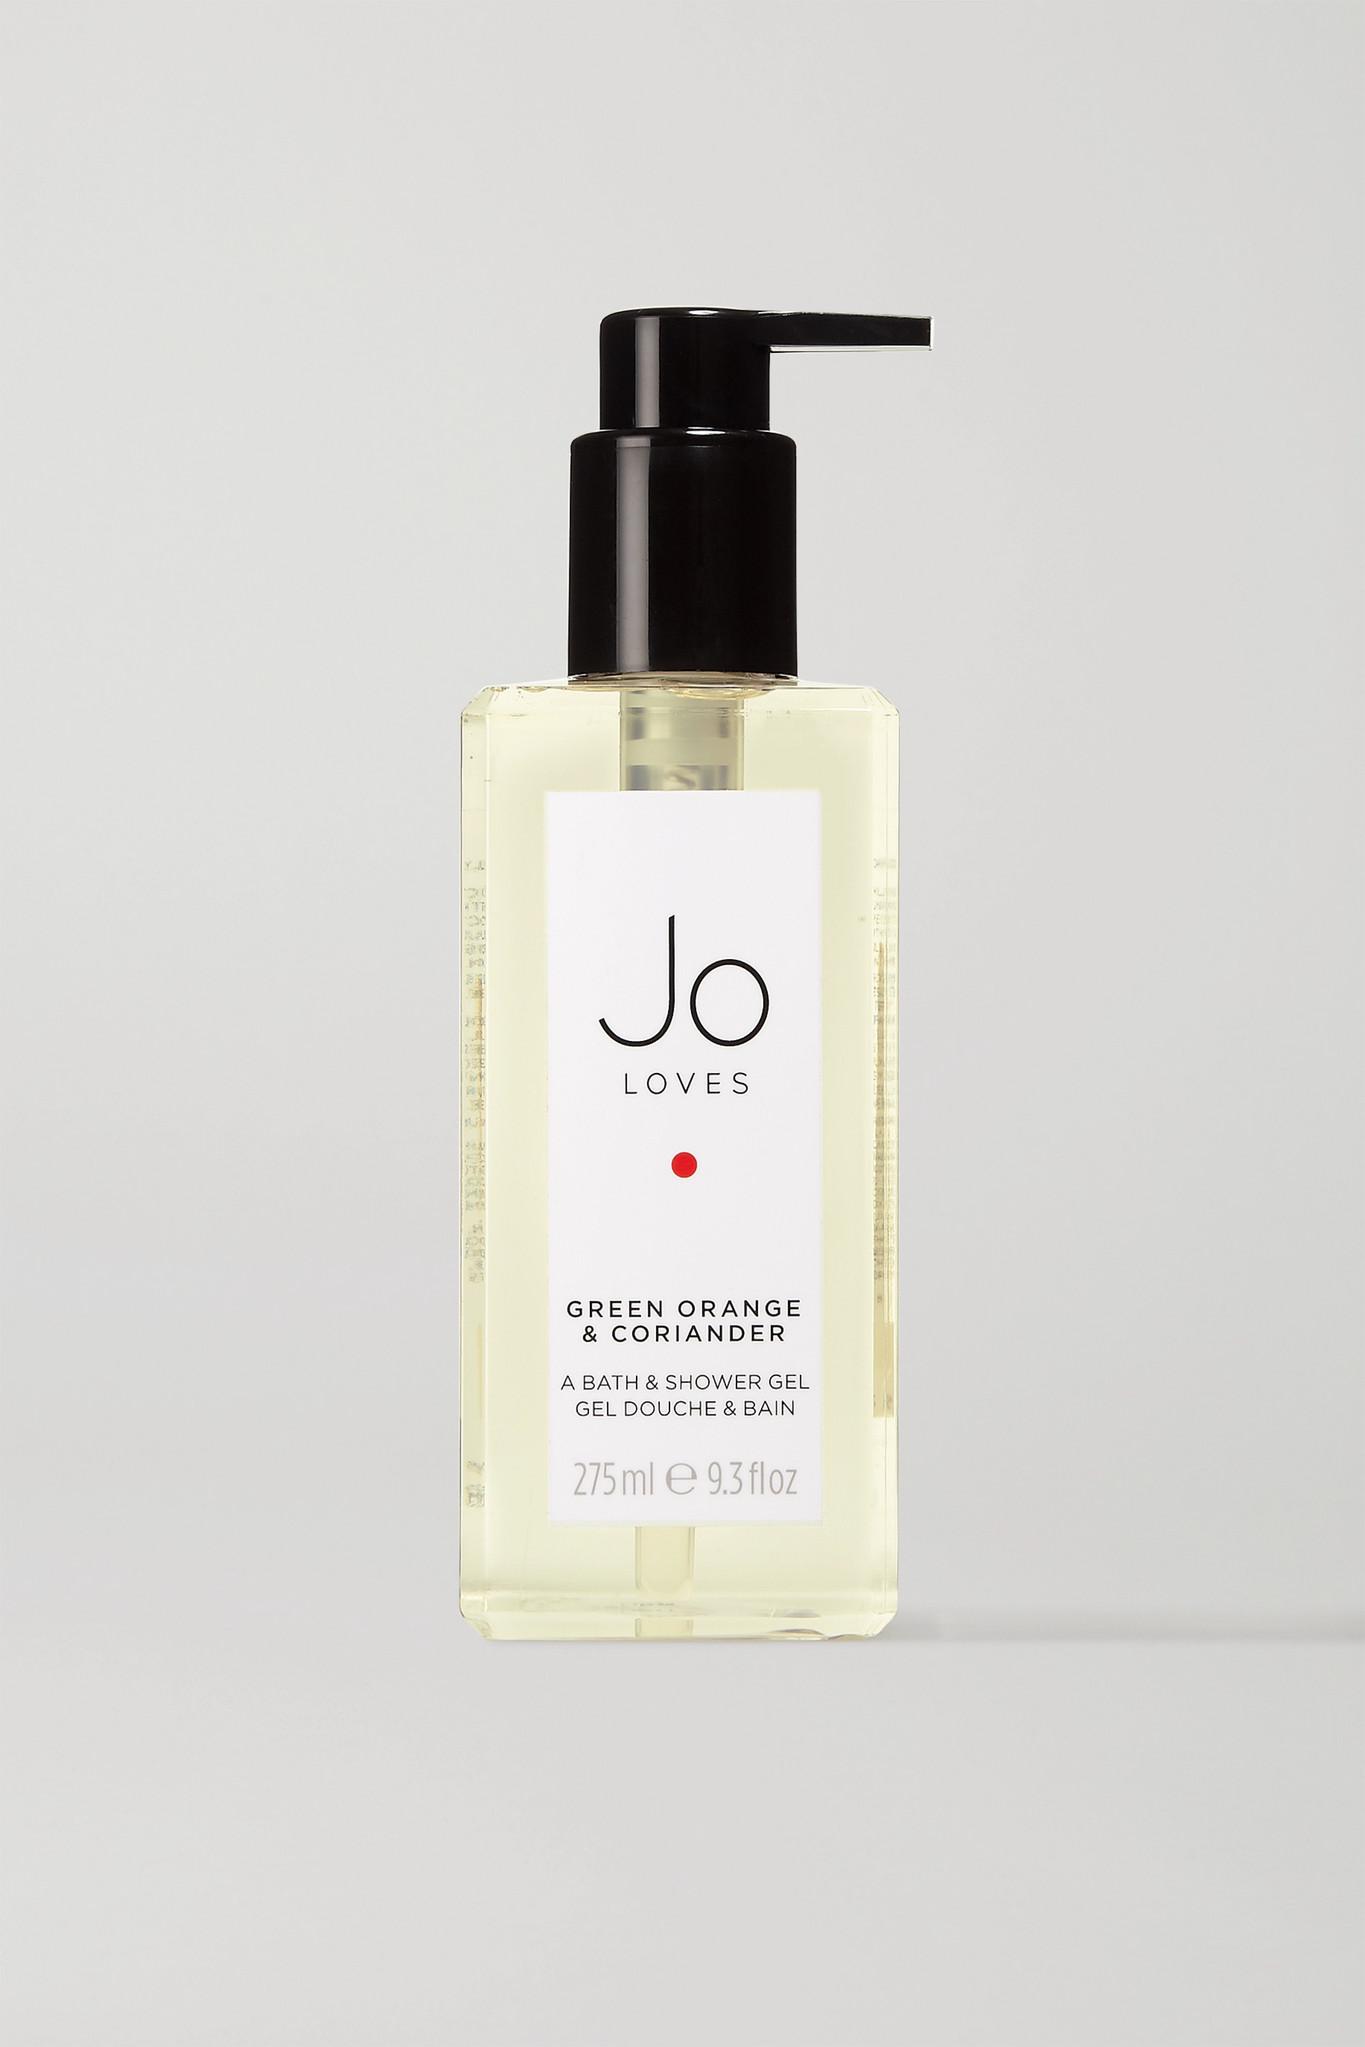 Jo Loves - 沐浴啫喱 - 绿橙、芜荽,275ml - 无色 - one size